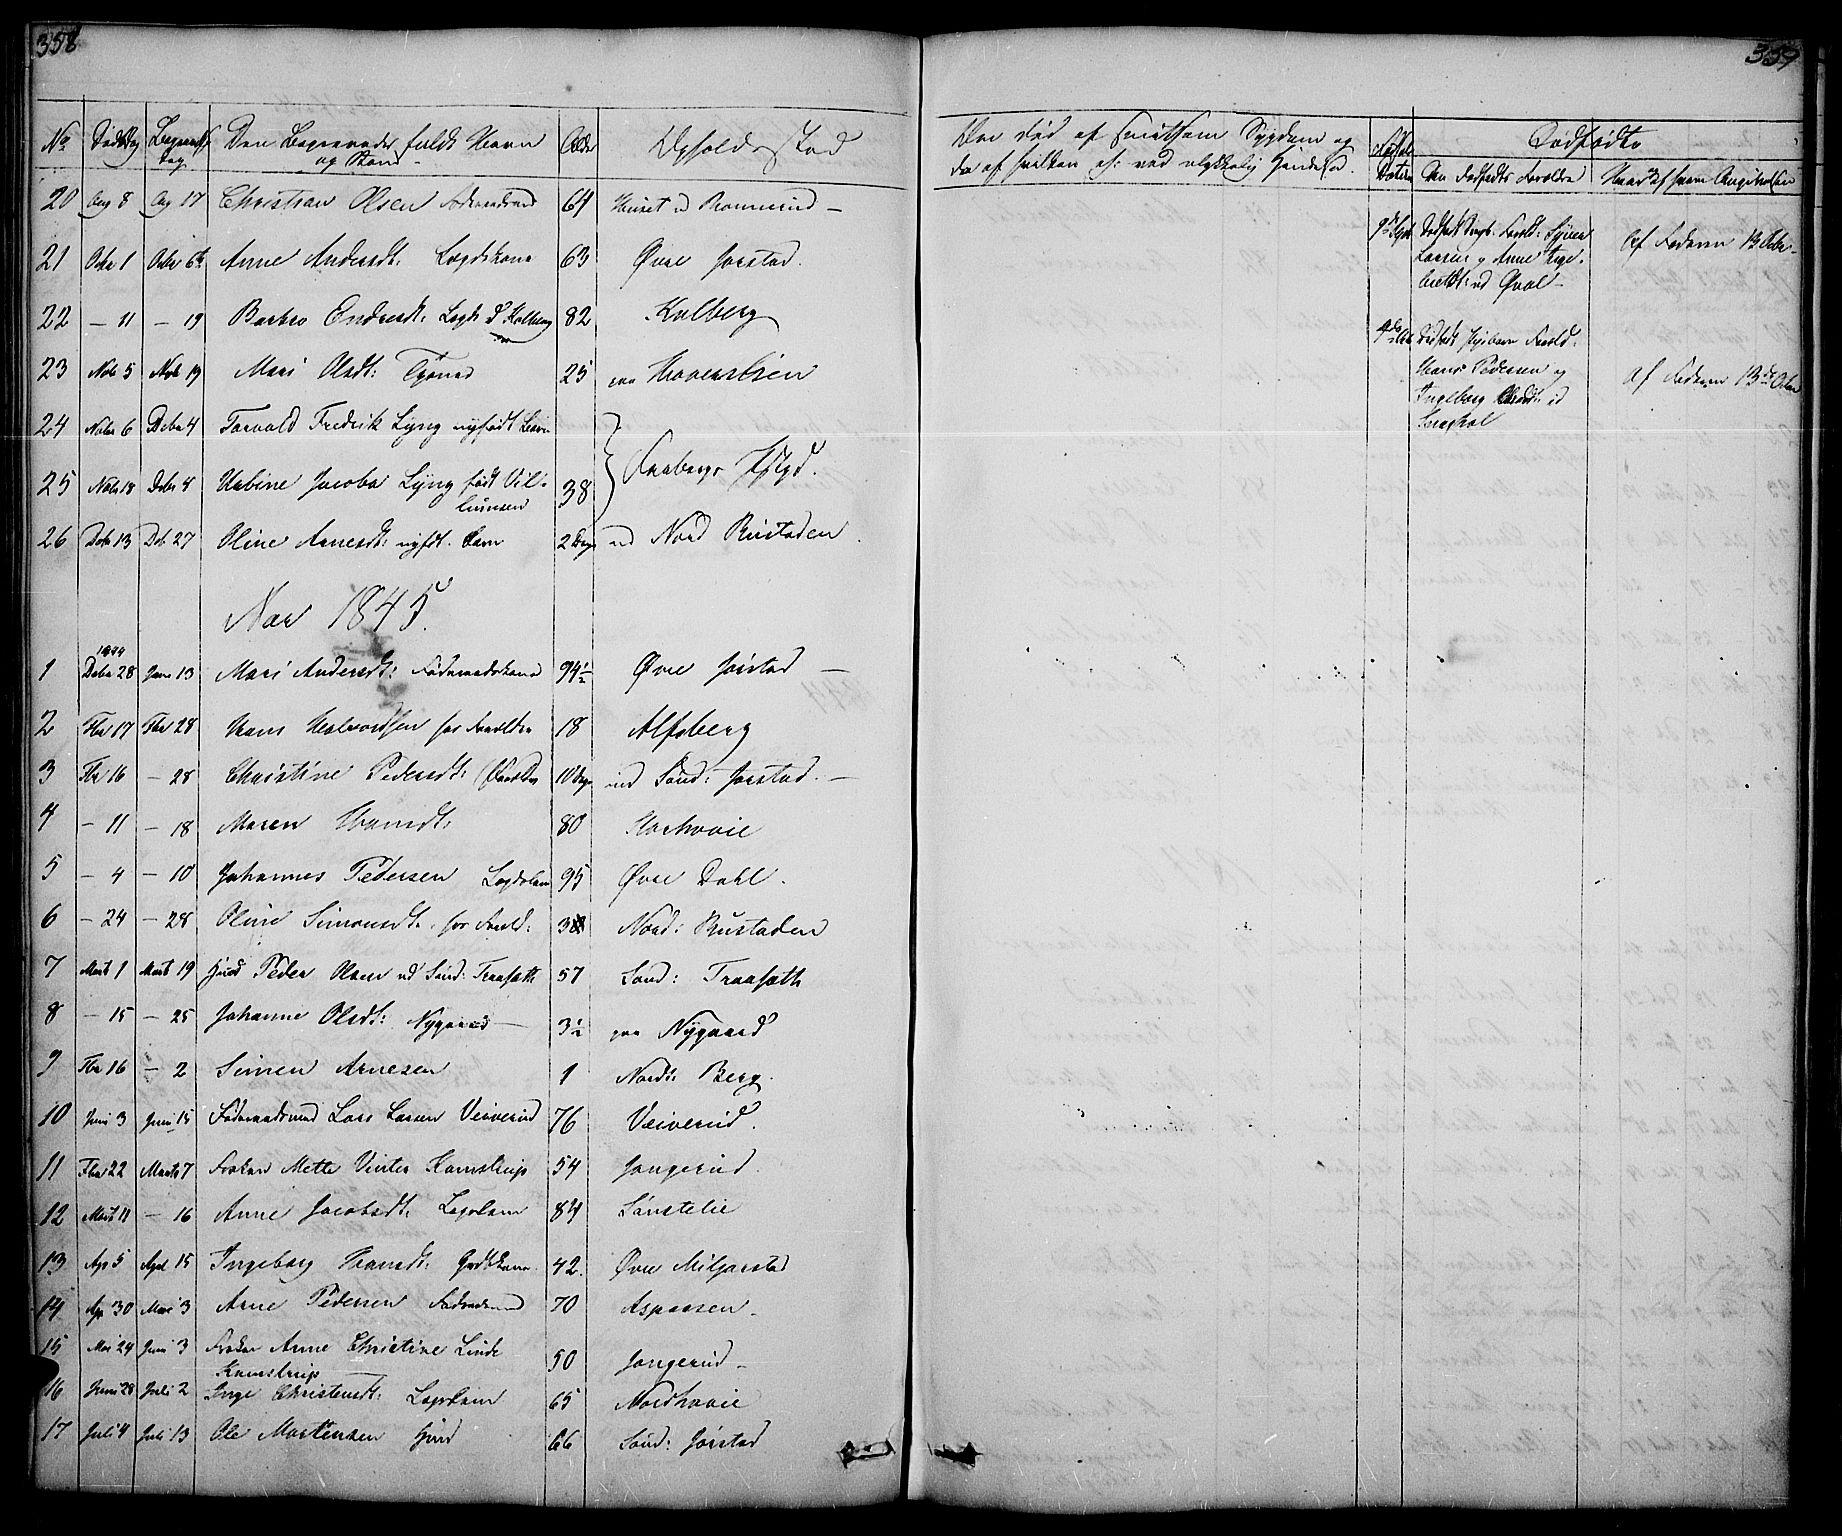 SAH, Fåberg prestekontor, Klokkerbok nr. 5, 1837-1864, s. 358-359